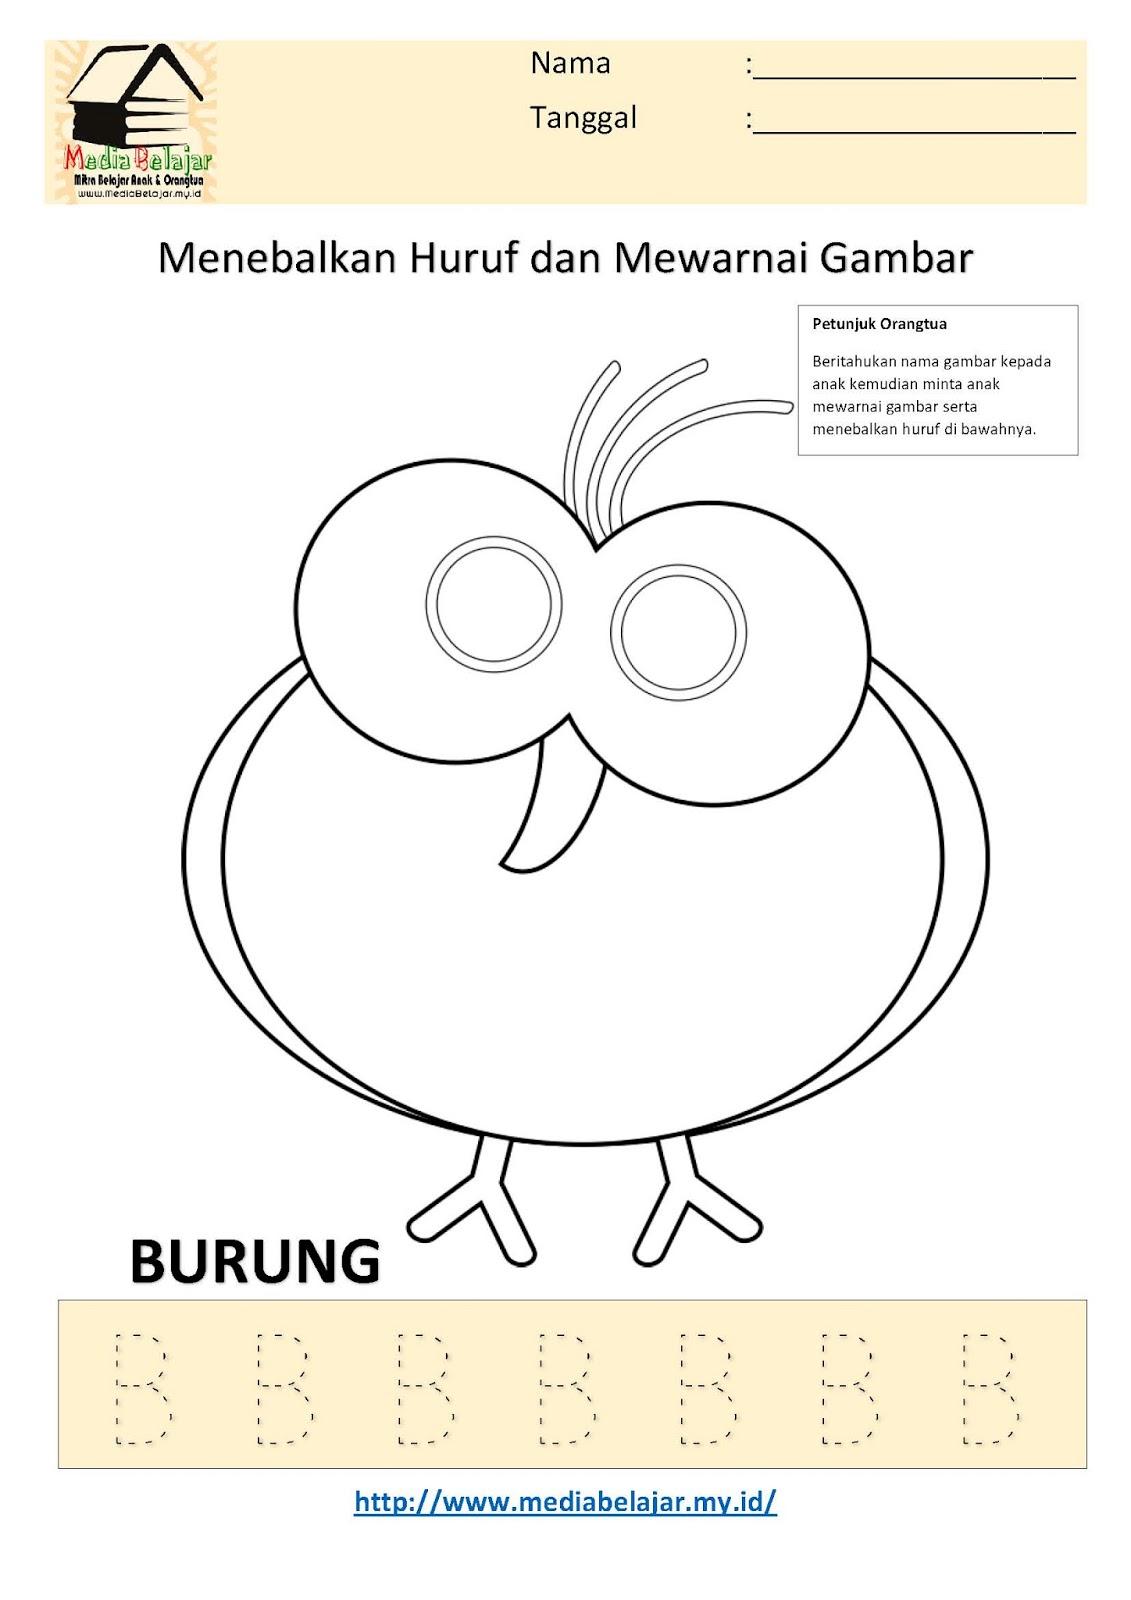 Menebalkan Huruf B Dan Mewarnai Gambar Burung